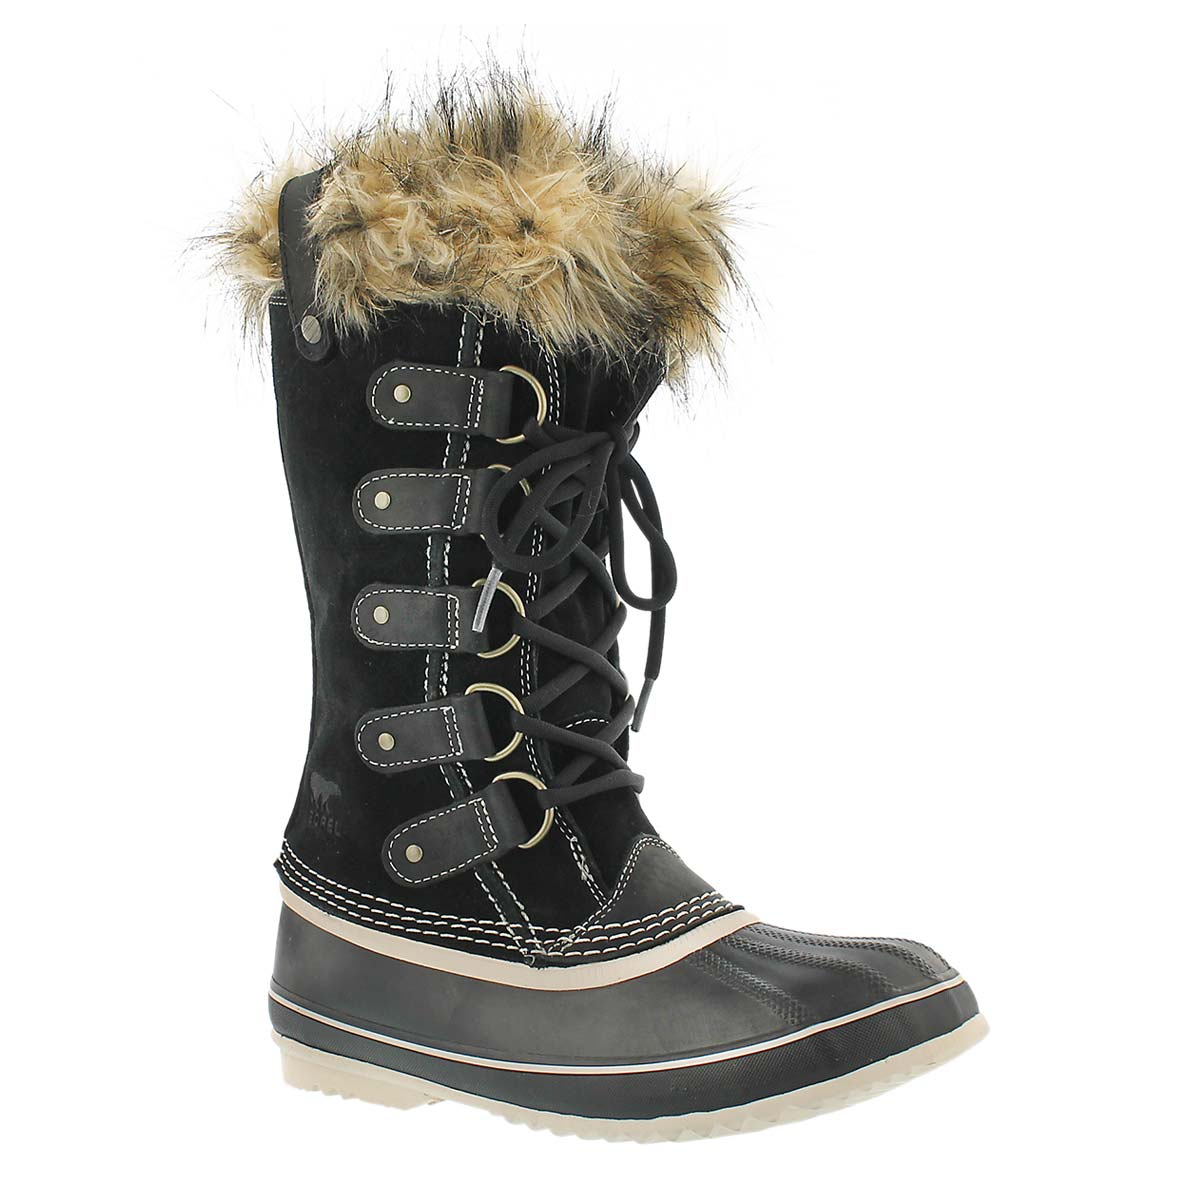 Botte d'hiver JOAN OF ARCTIC, noir, fem